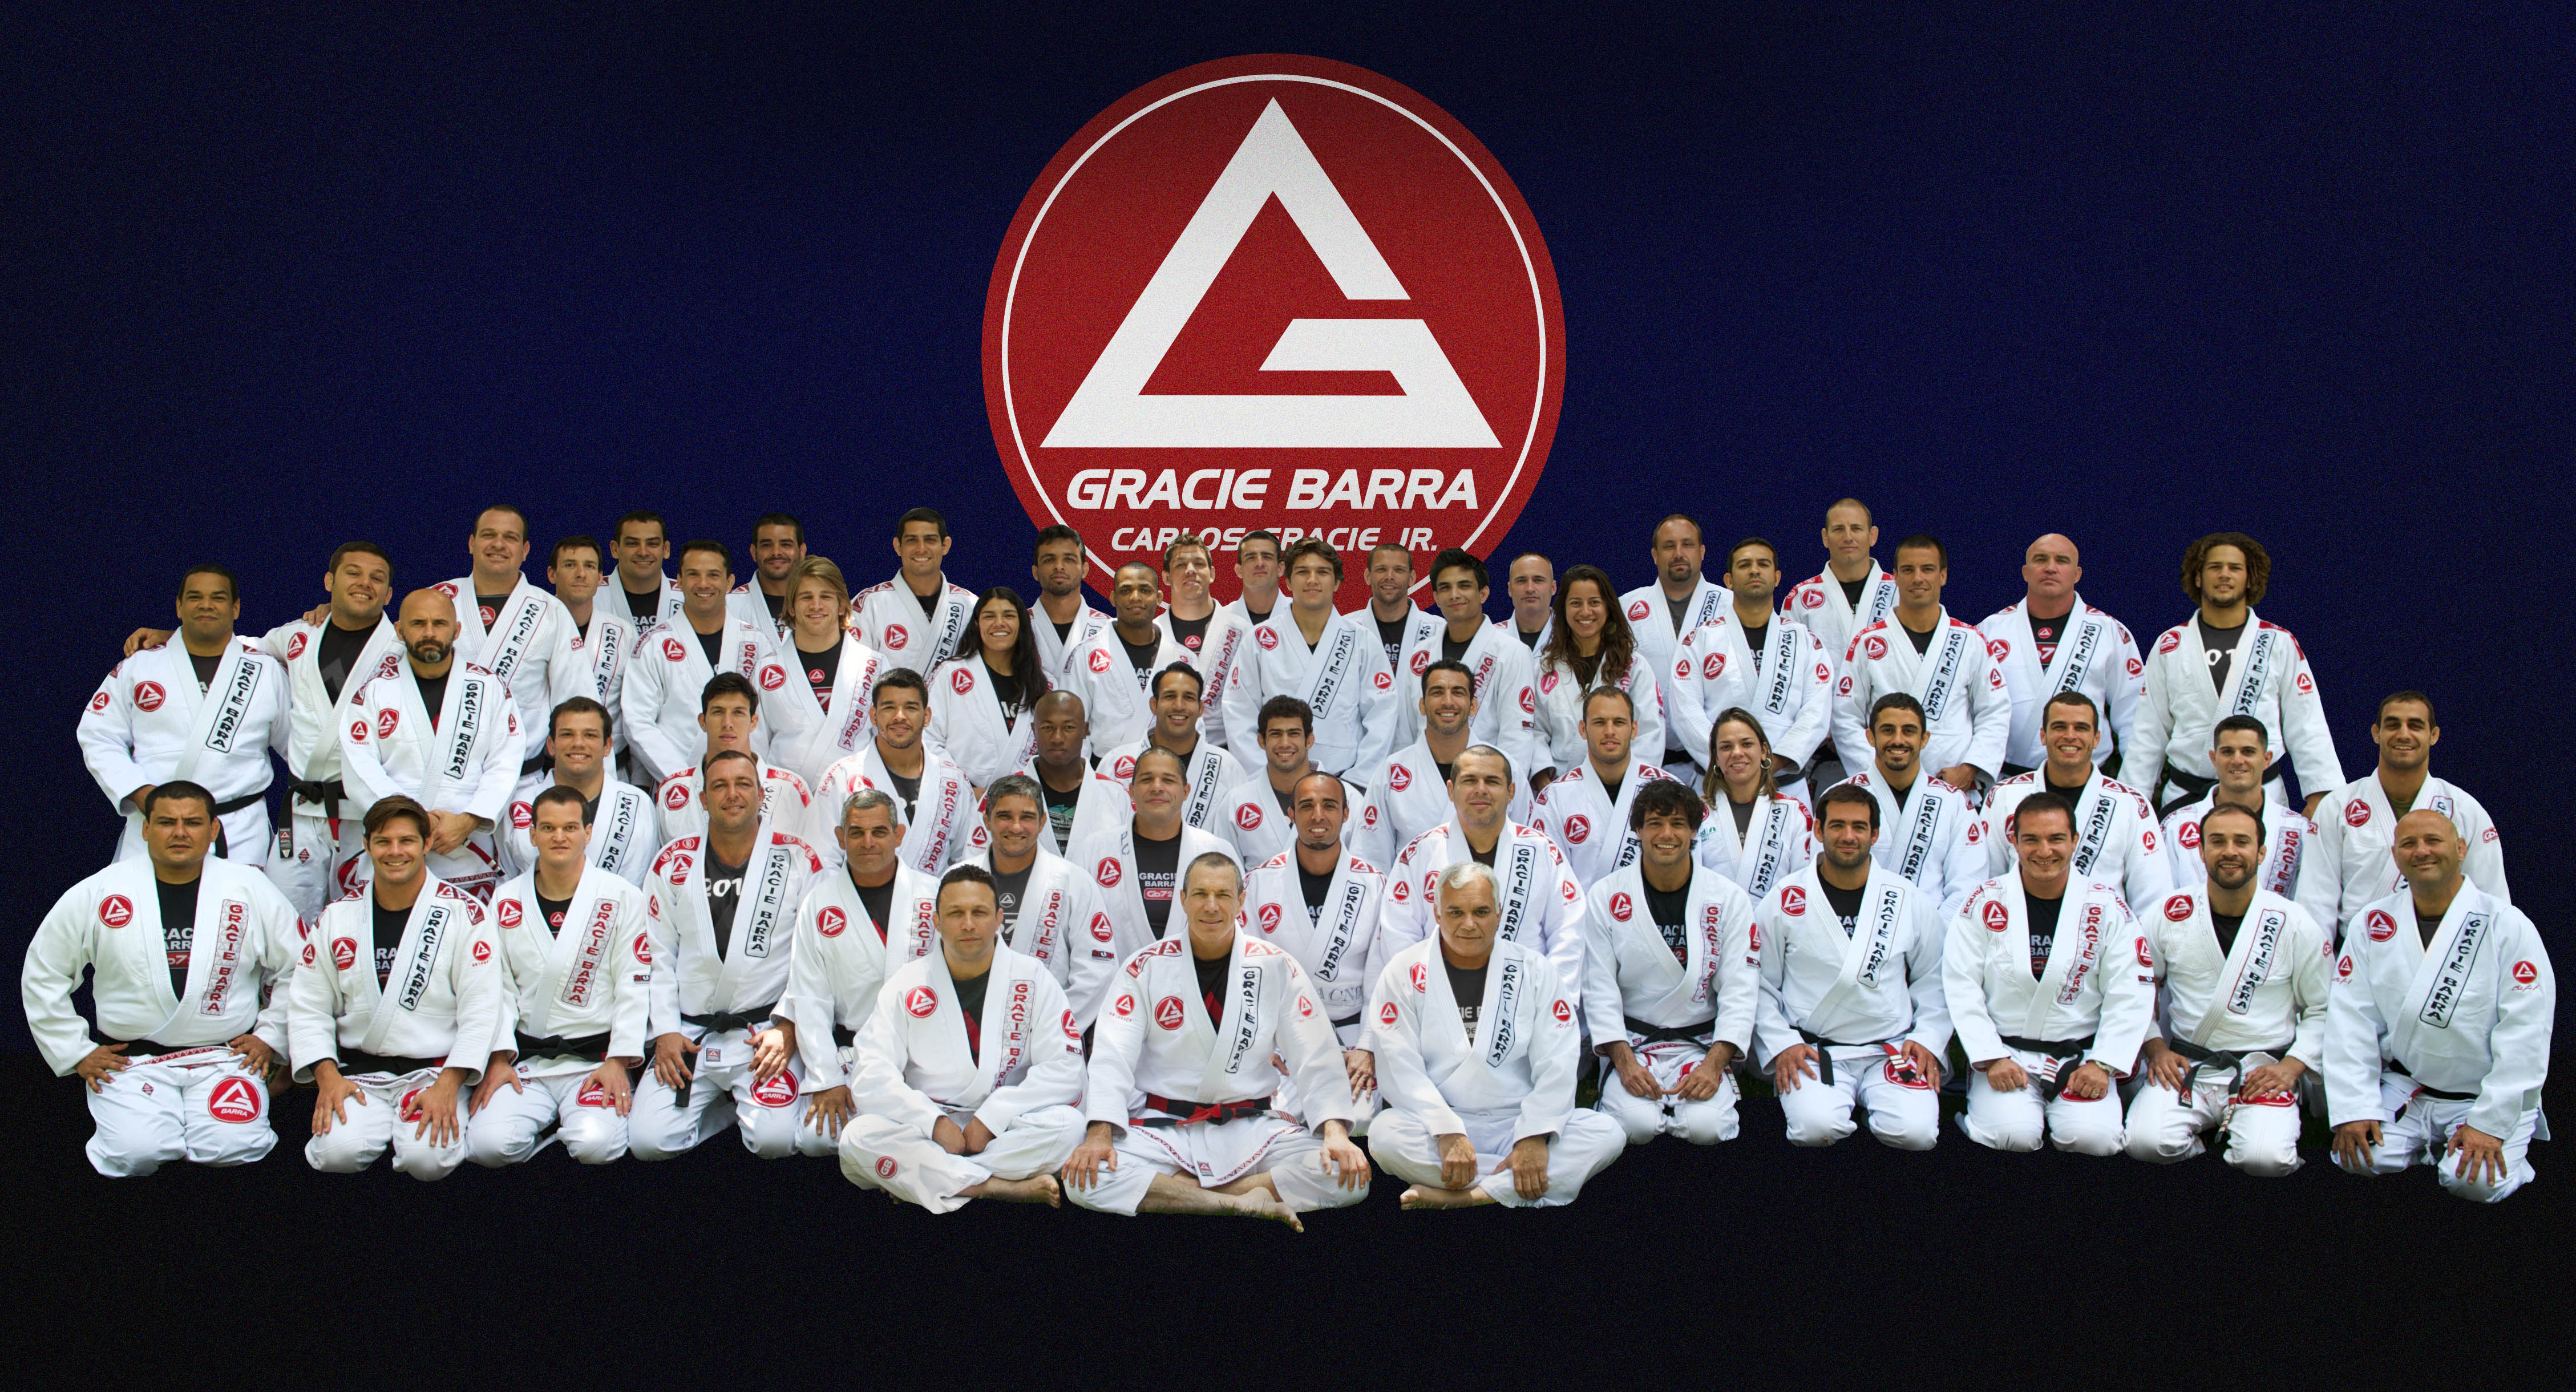 Icp 4 Revisited Register Here Gracie Barra Brazilian